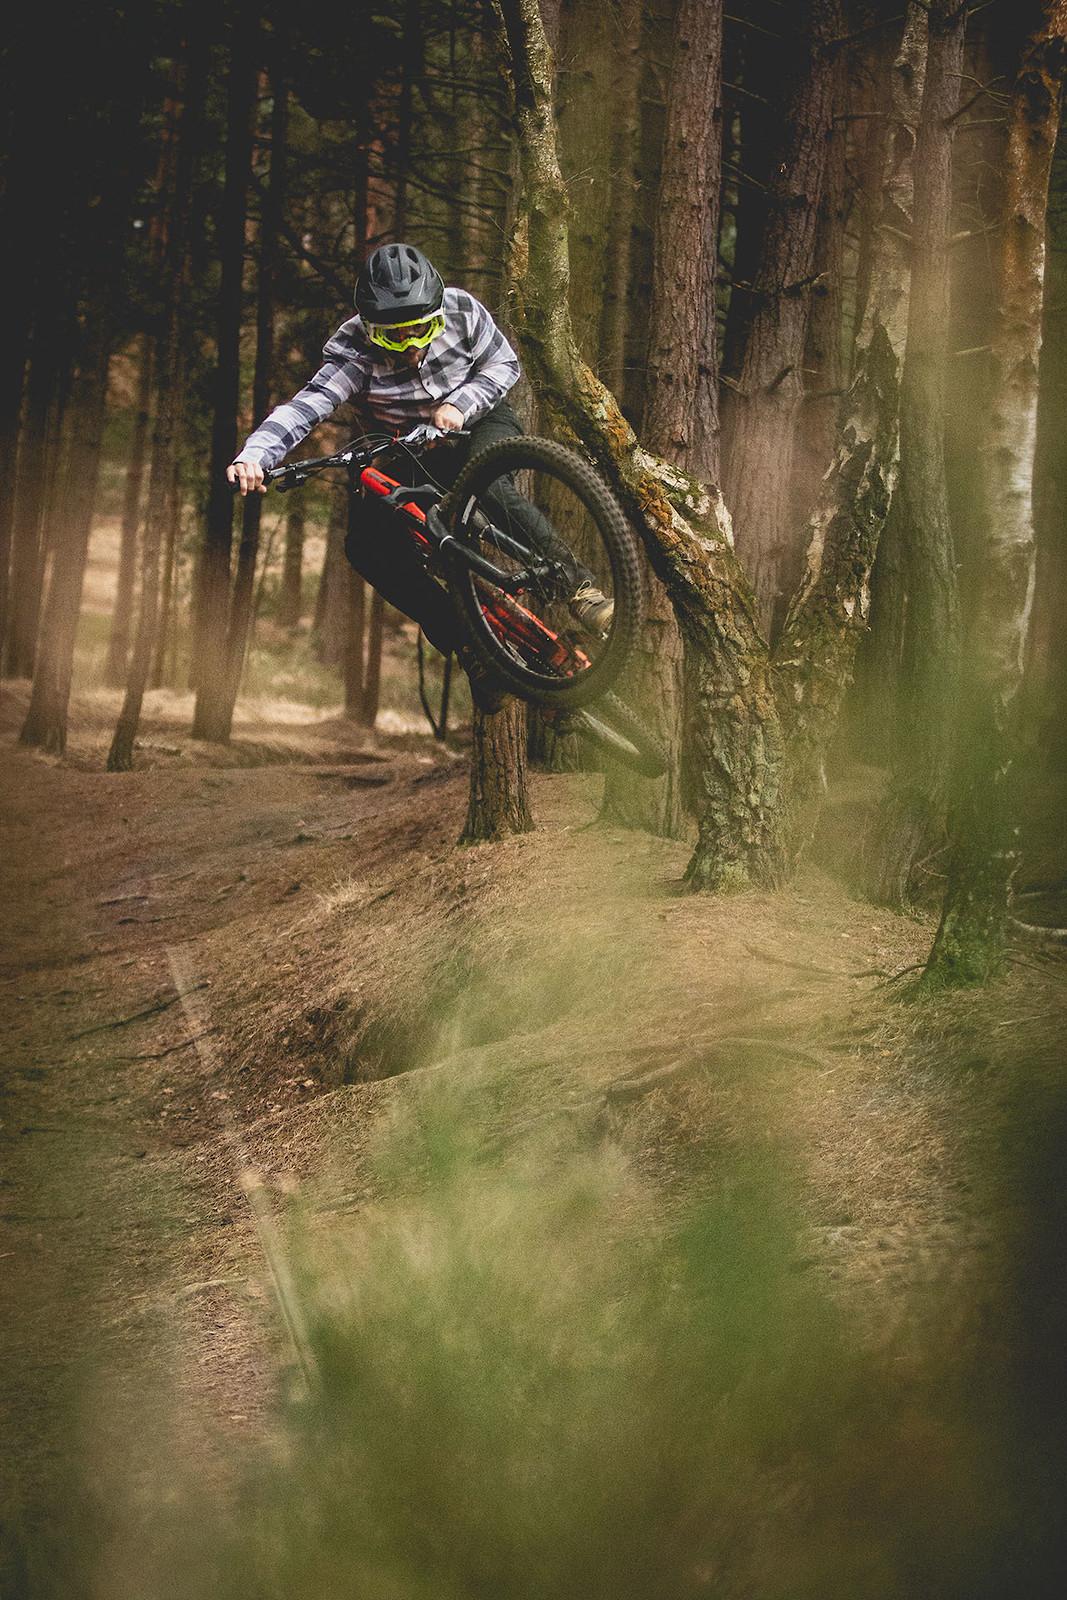 Turn-bar self portrait - cagreenwood - Mountain Biking Pictures - Vital MTB